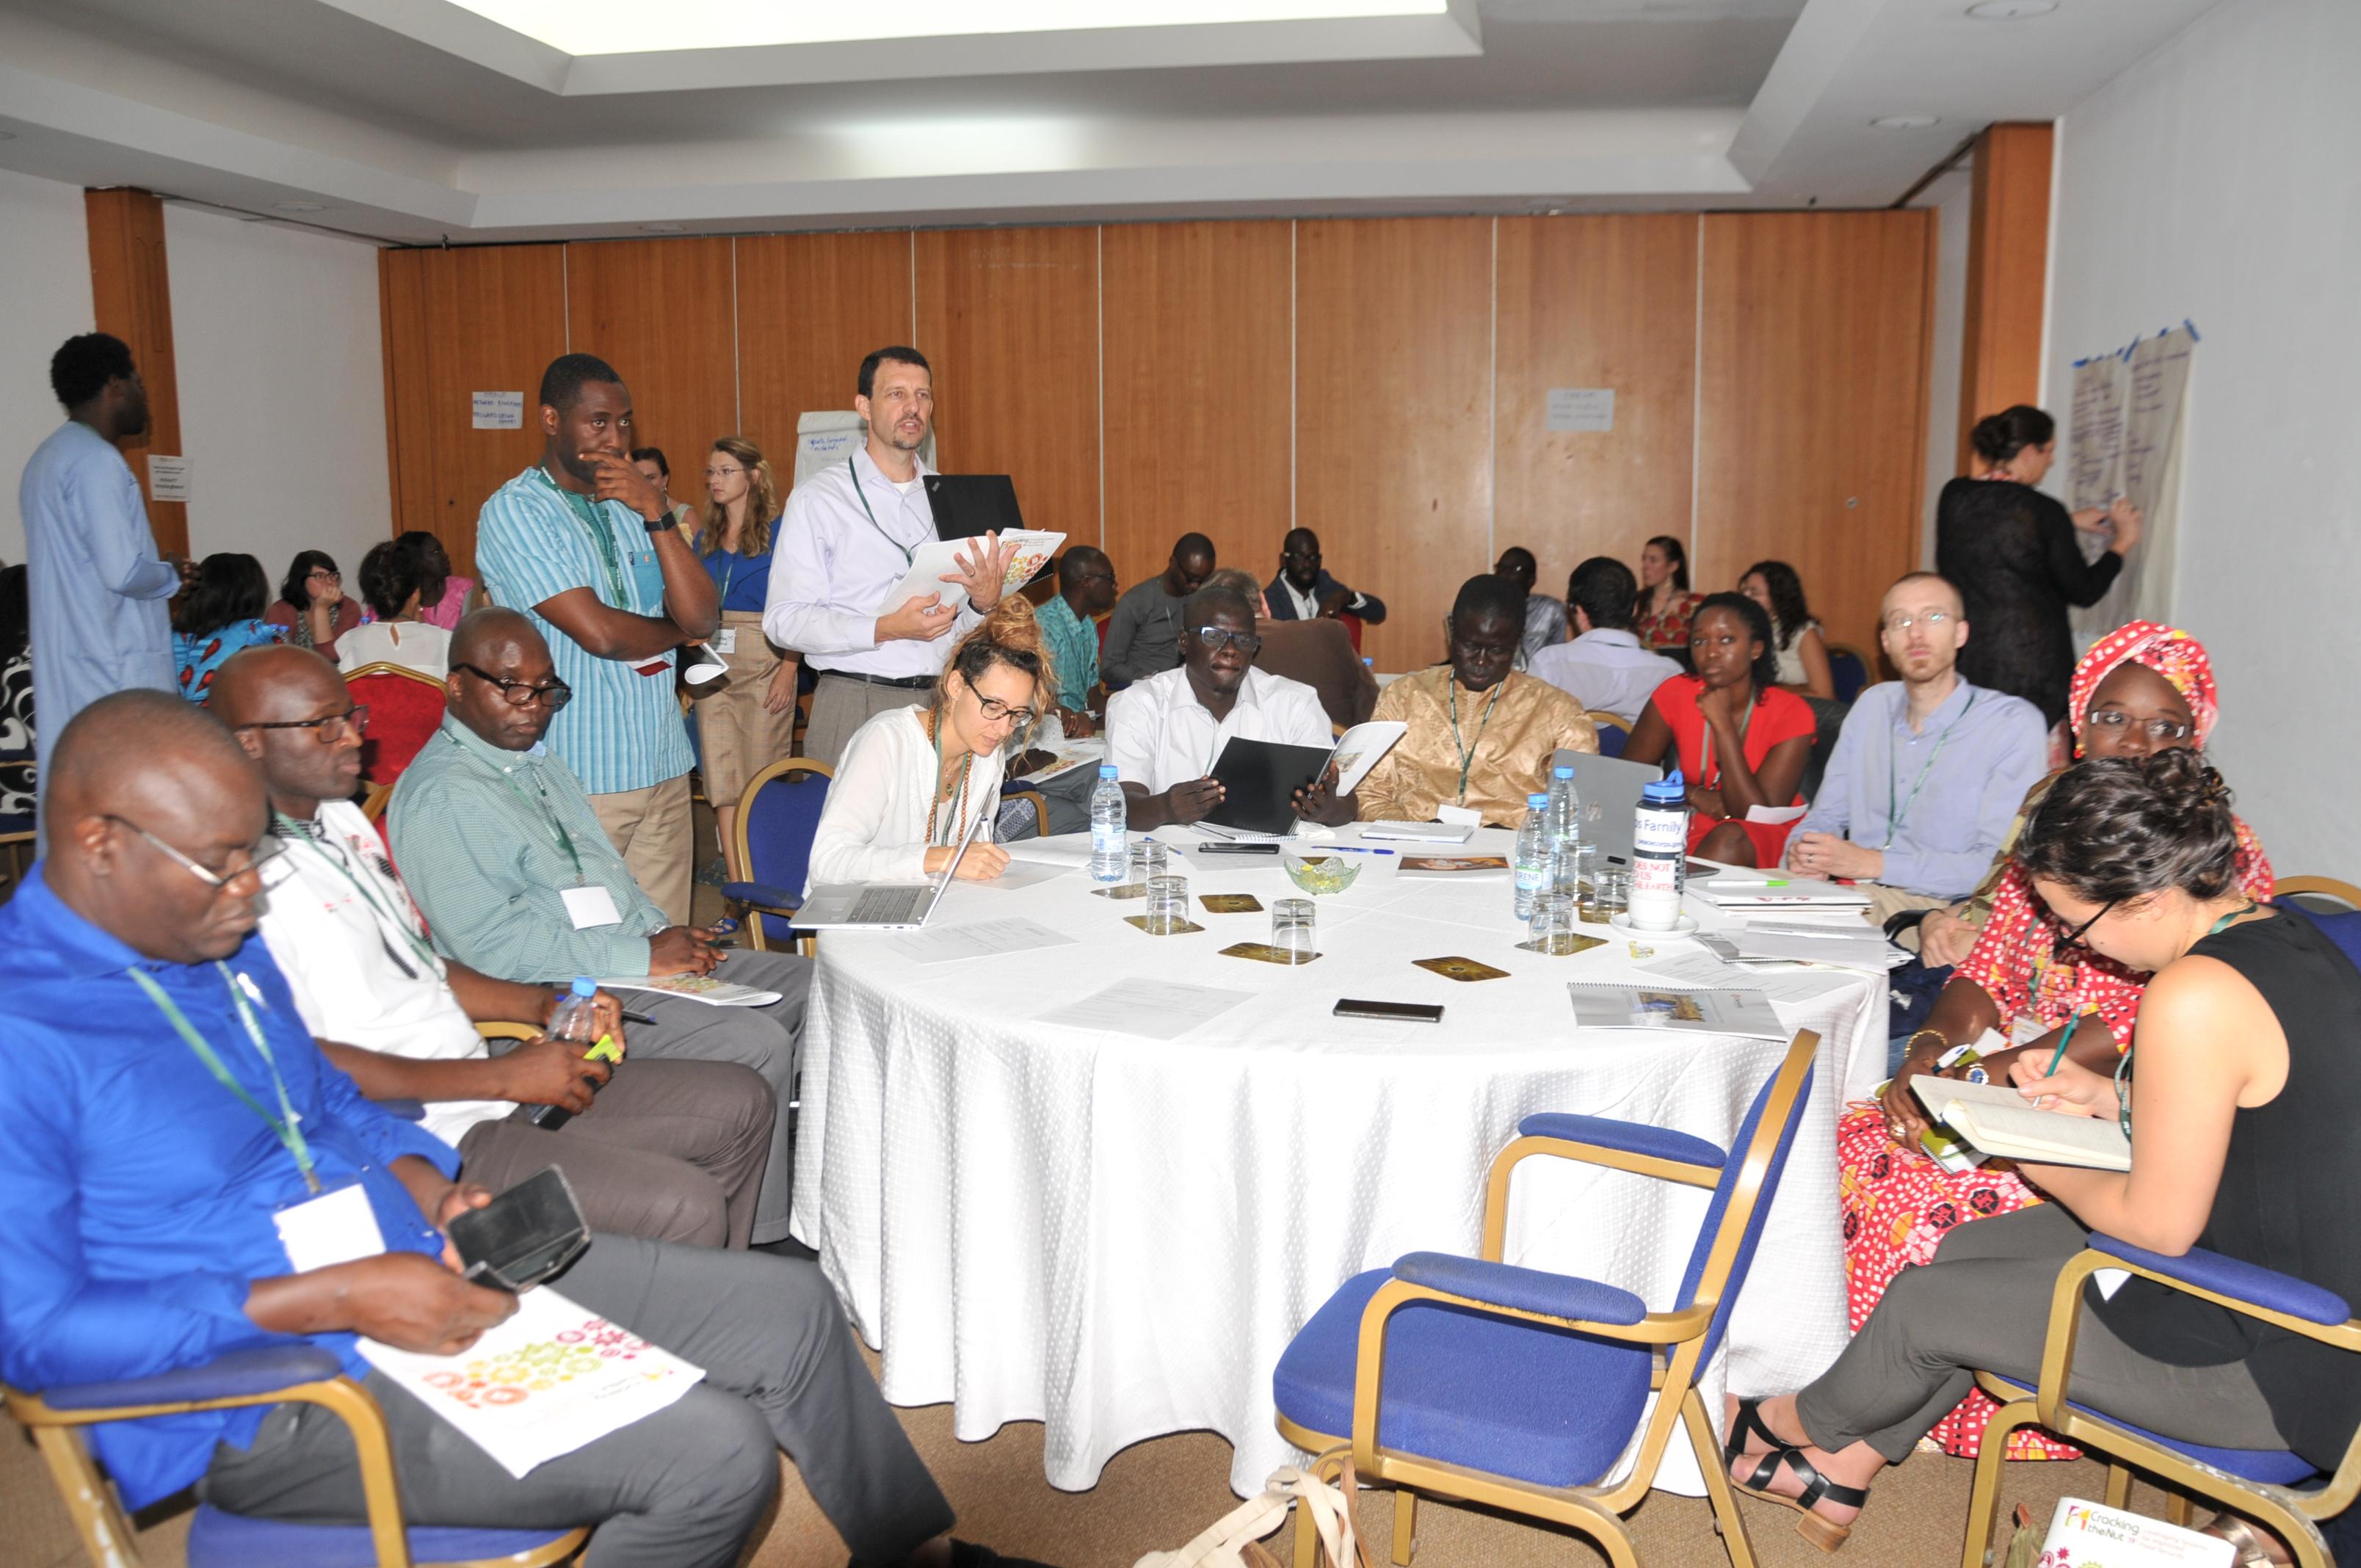 Participants at Cracking the Nut 2019 in Dakar, Senegal